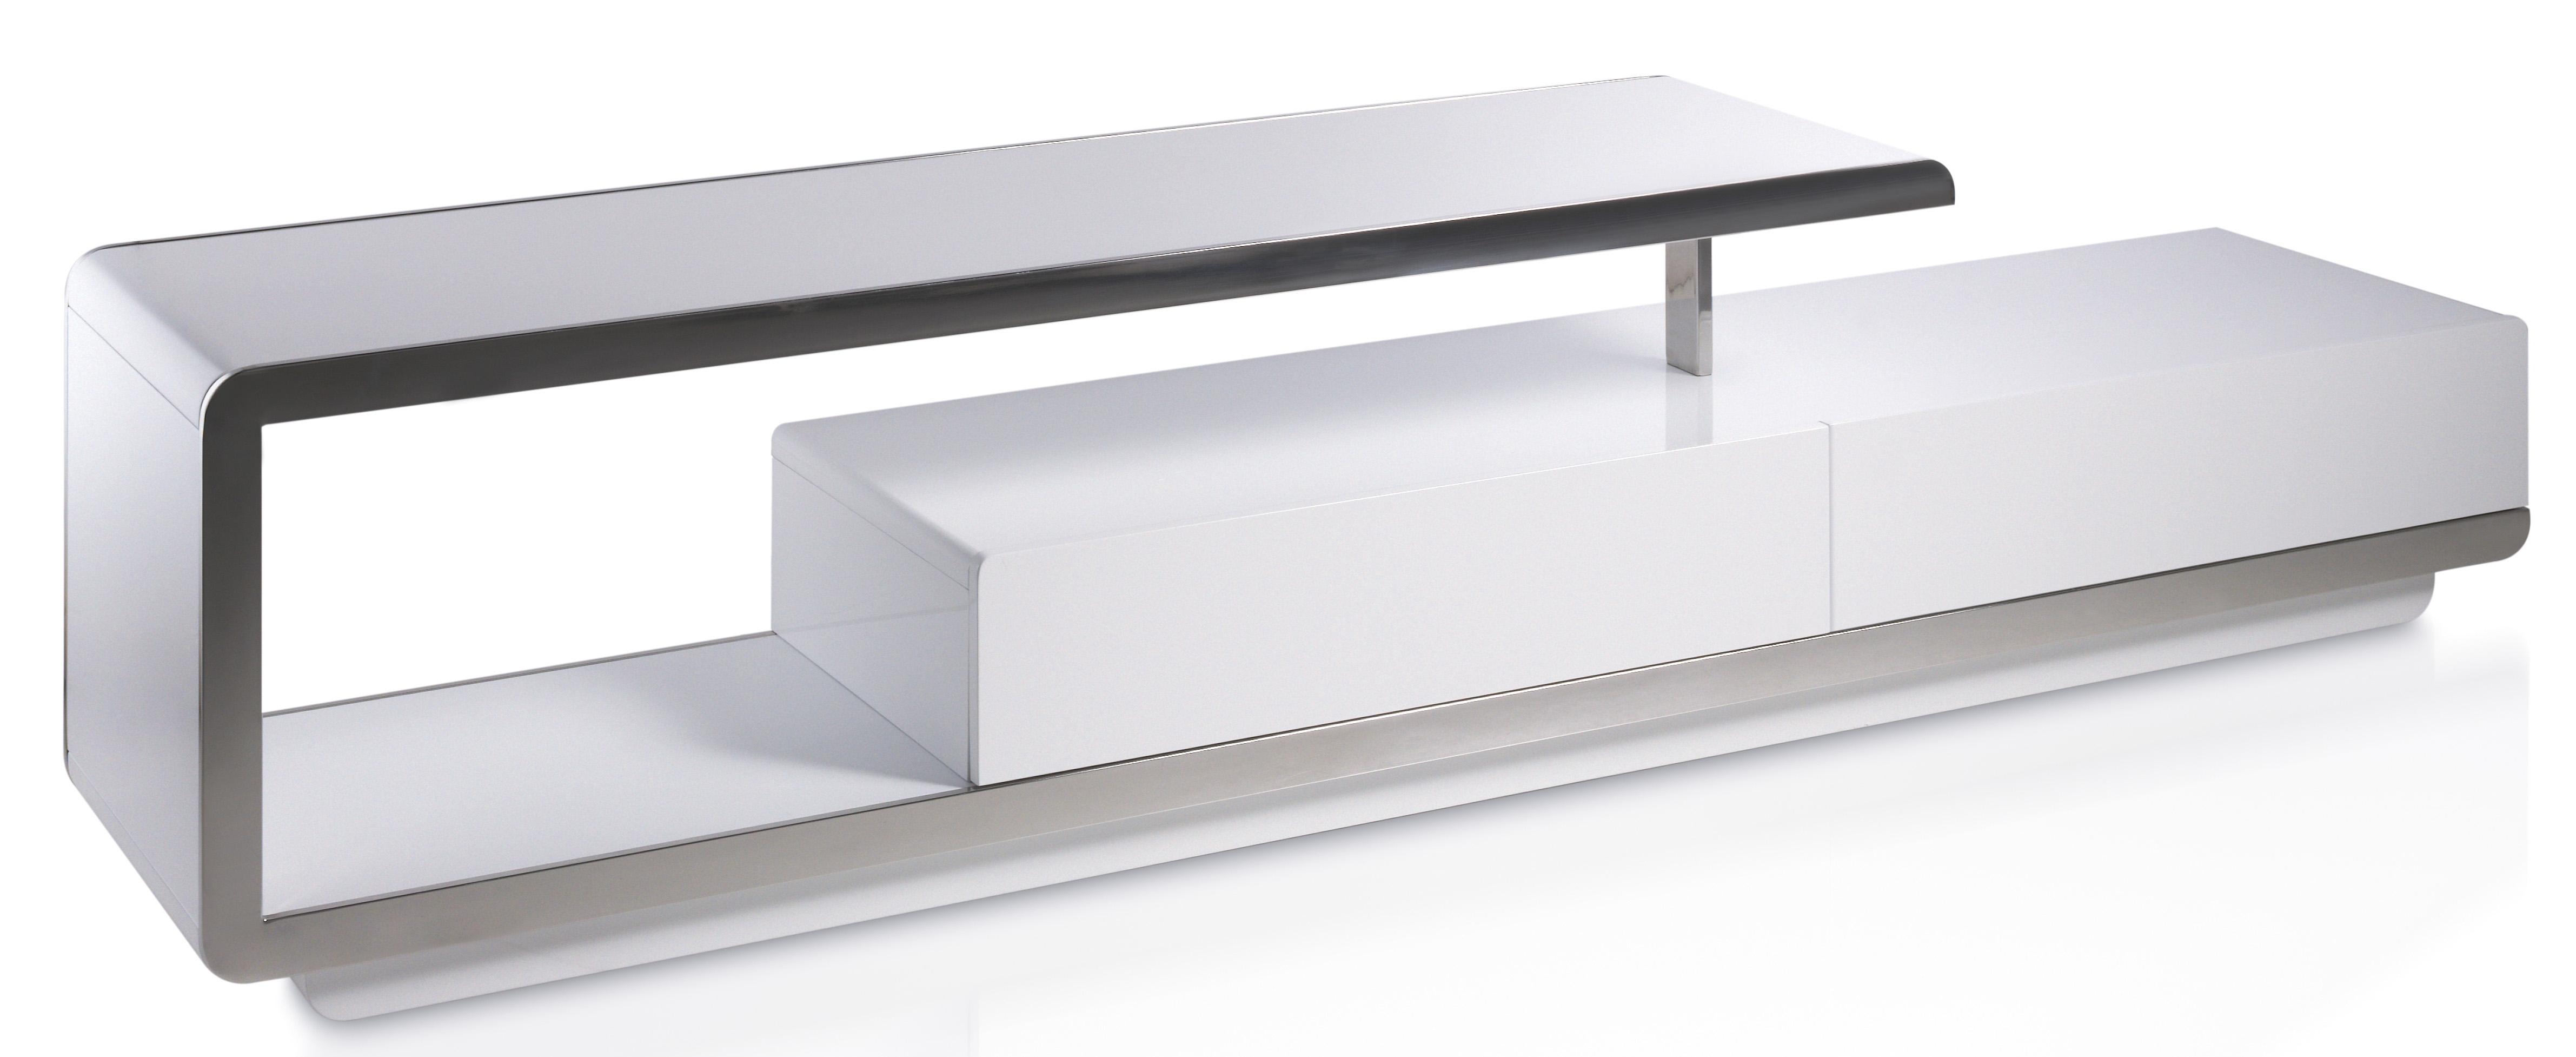 Meuble Tv Design 2 Tiroirs Bois Laque Blanc Et Acier Chrome Modena